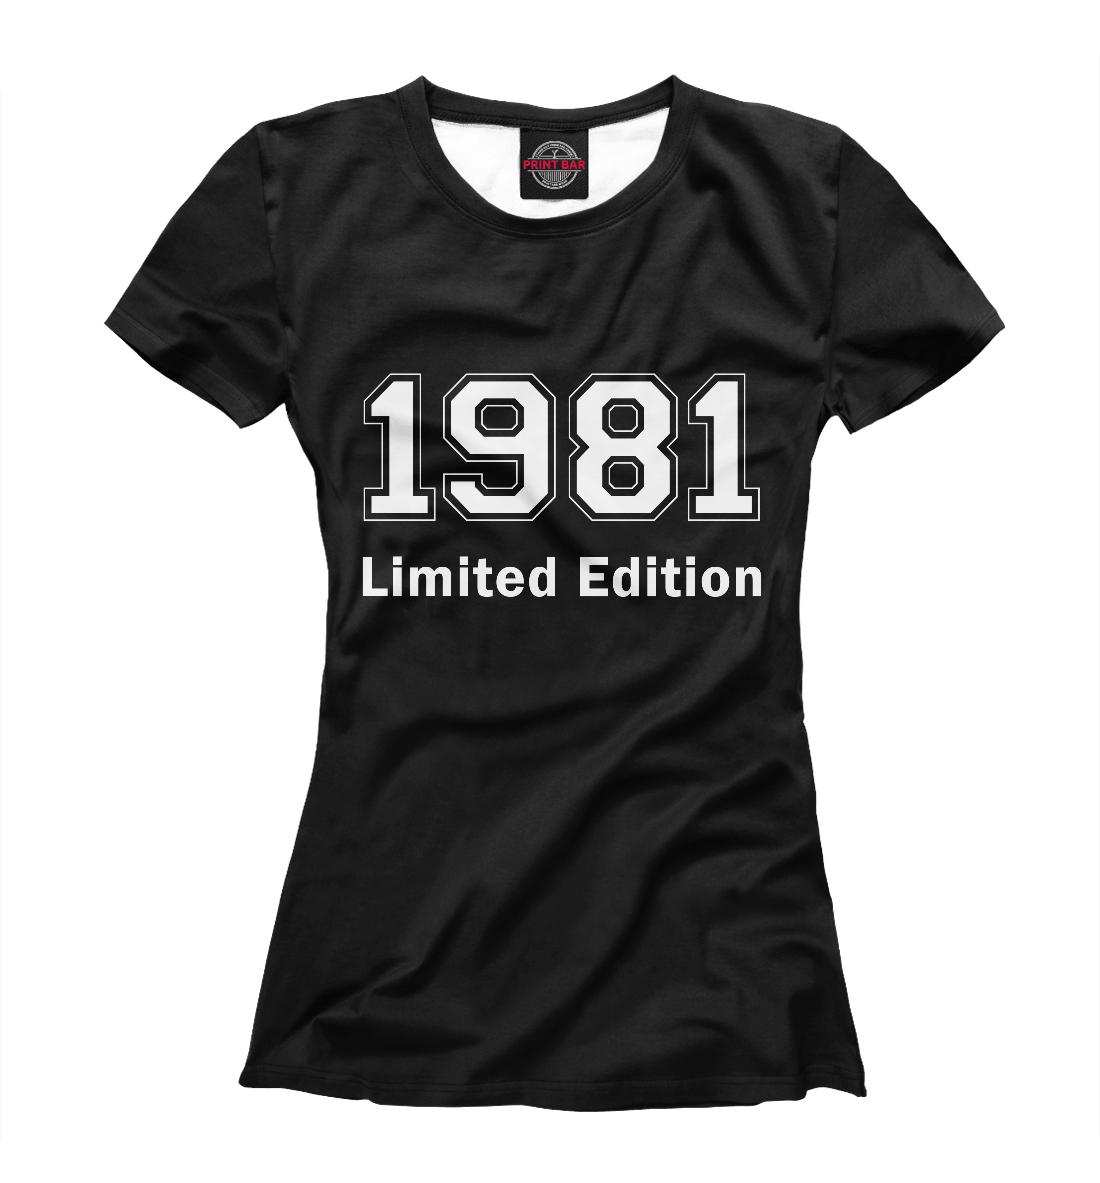 Купить 1981 Limited Edition, Printbar, Футболки, DVO-290625-fut-1